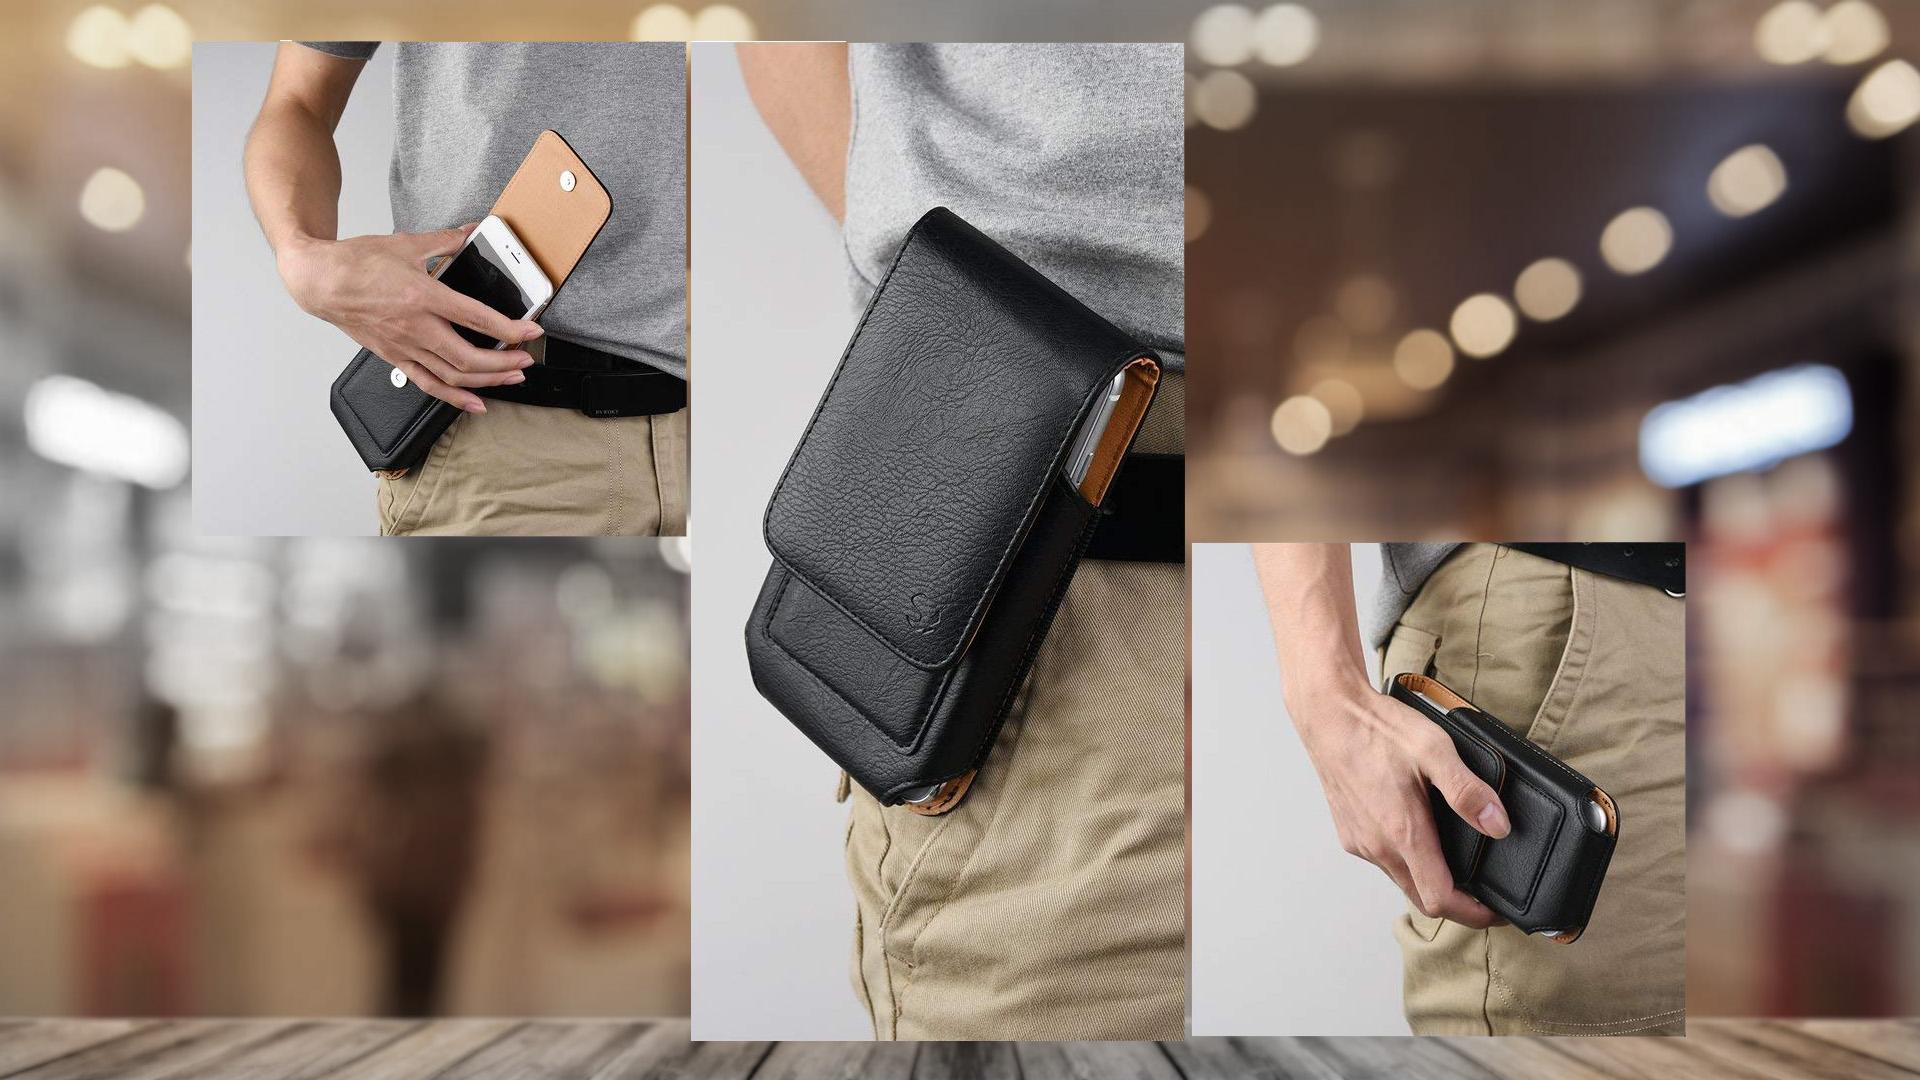 Best iPhone 11 Belt Clip Cases in 2021